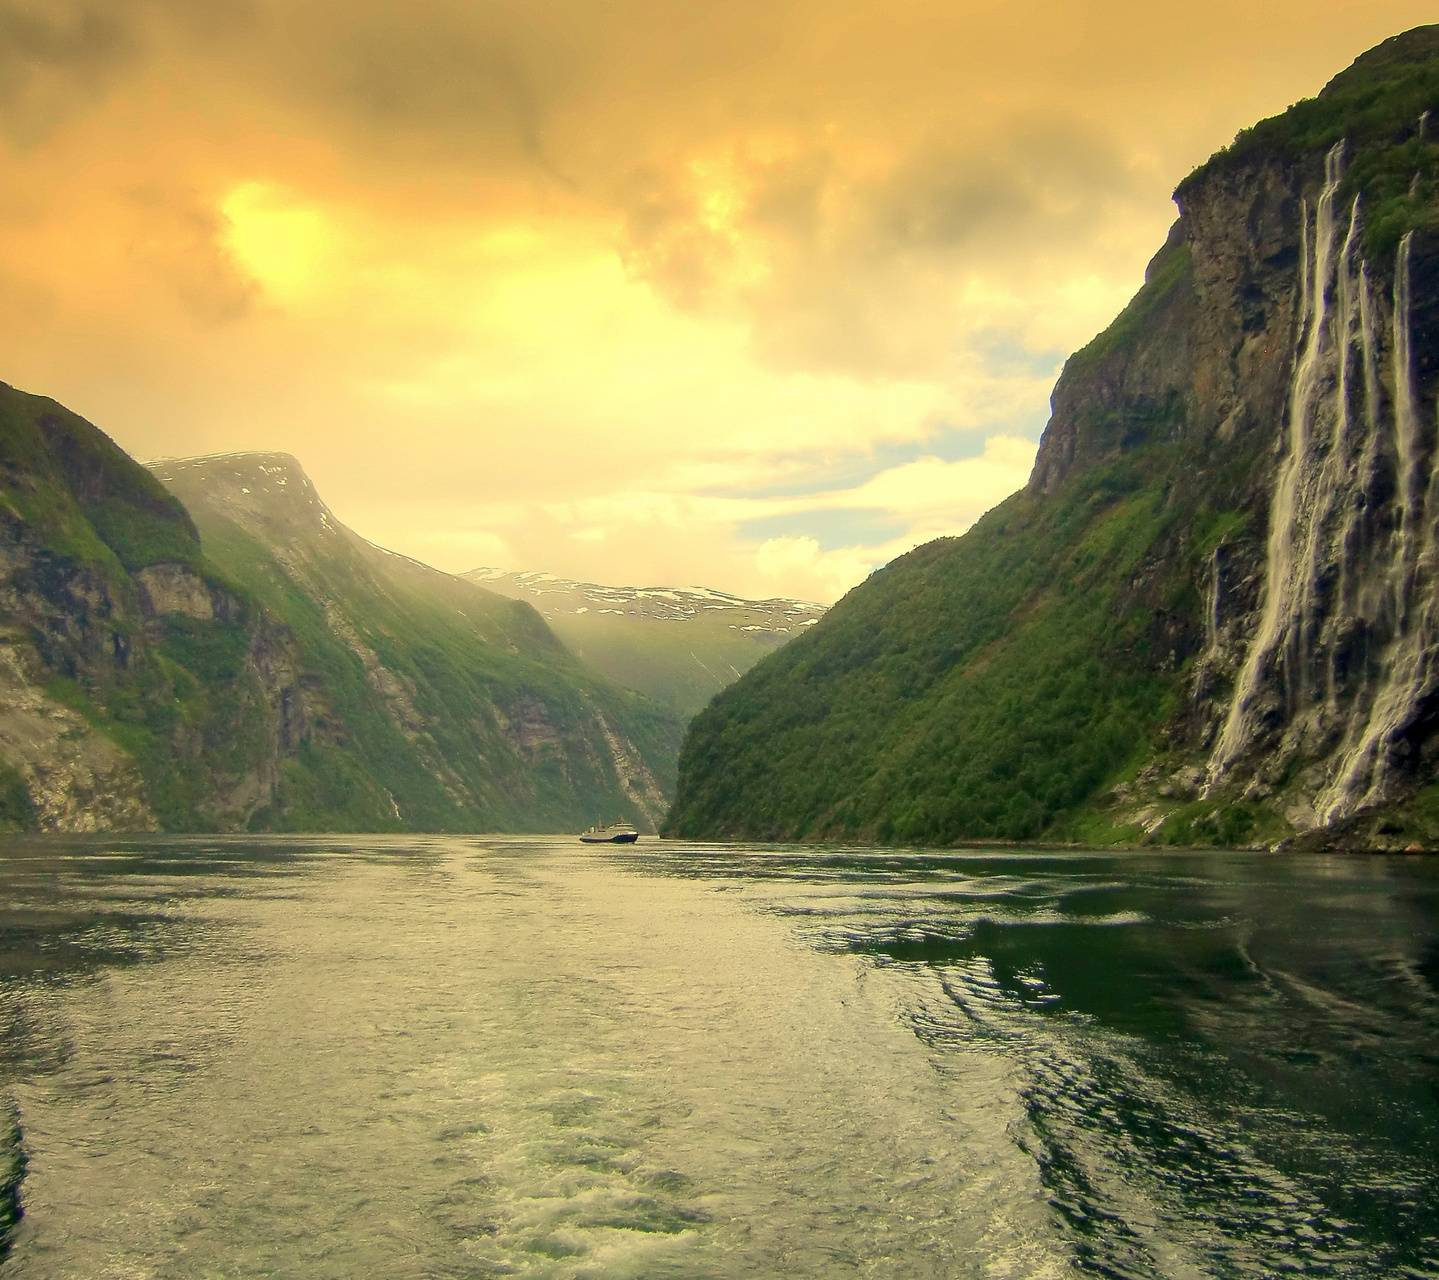 Mountain River Hd